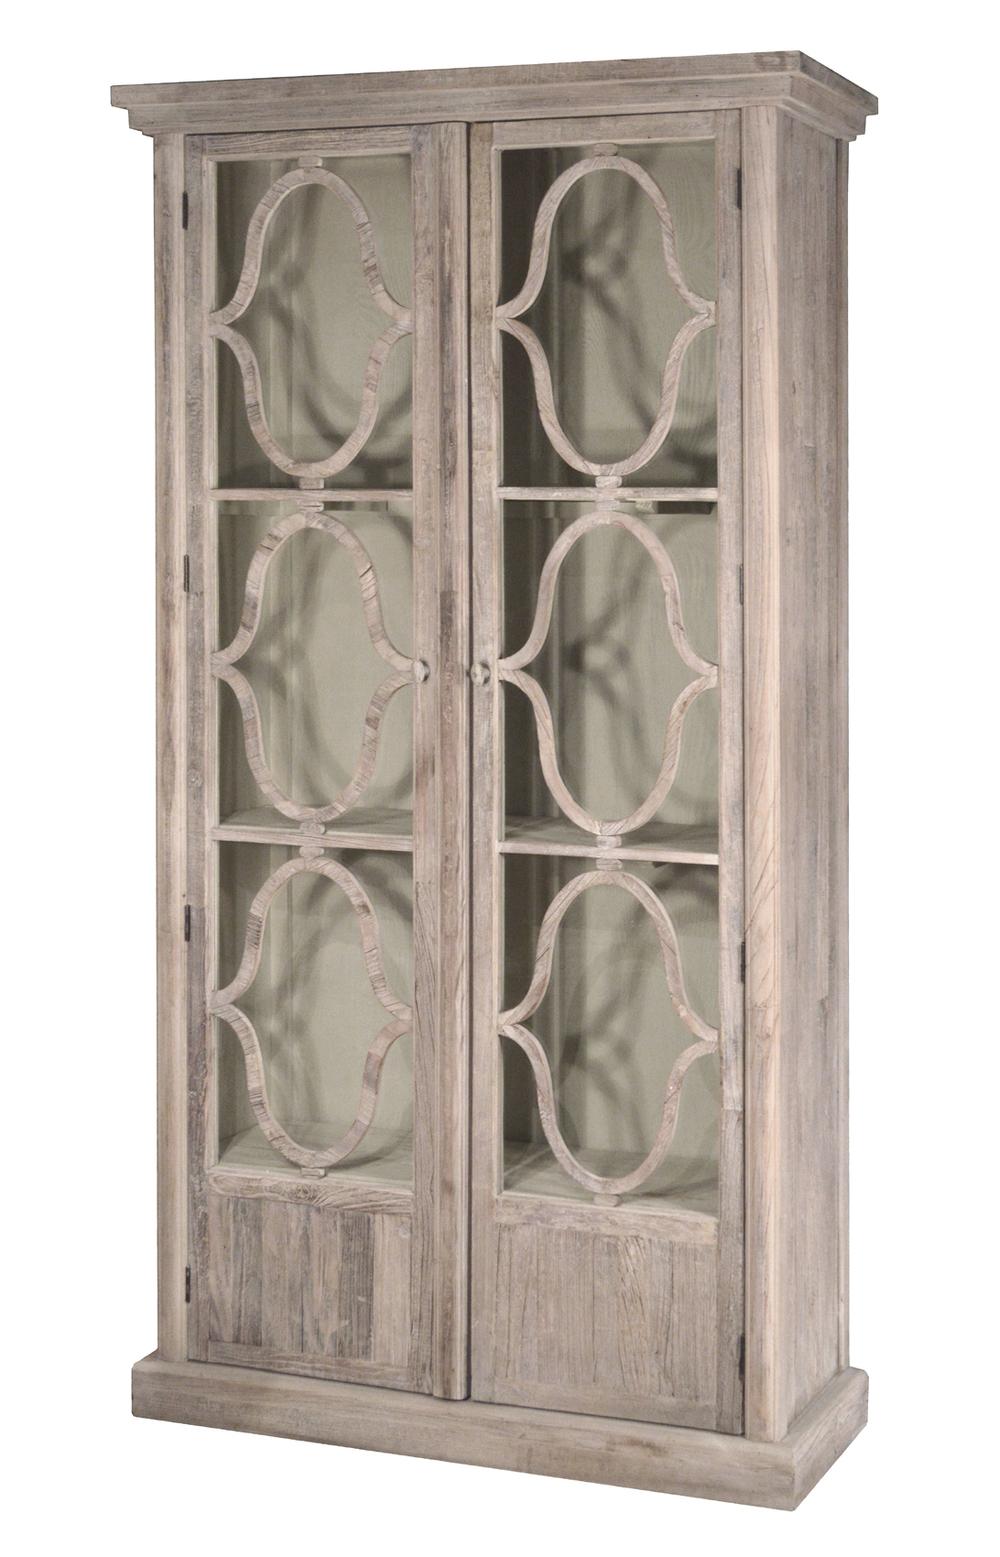 GJ Styles - Decorative Glass Cabinet